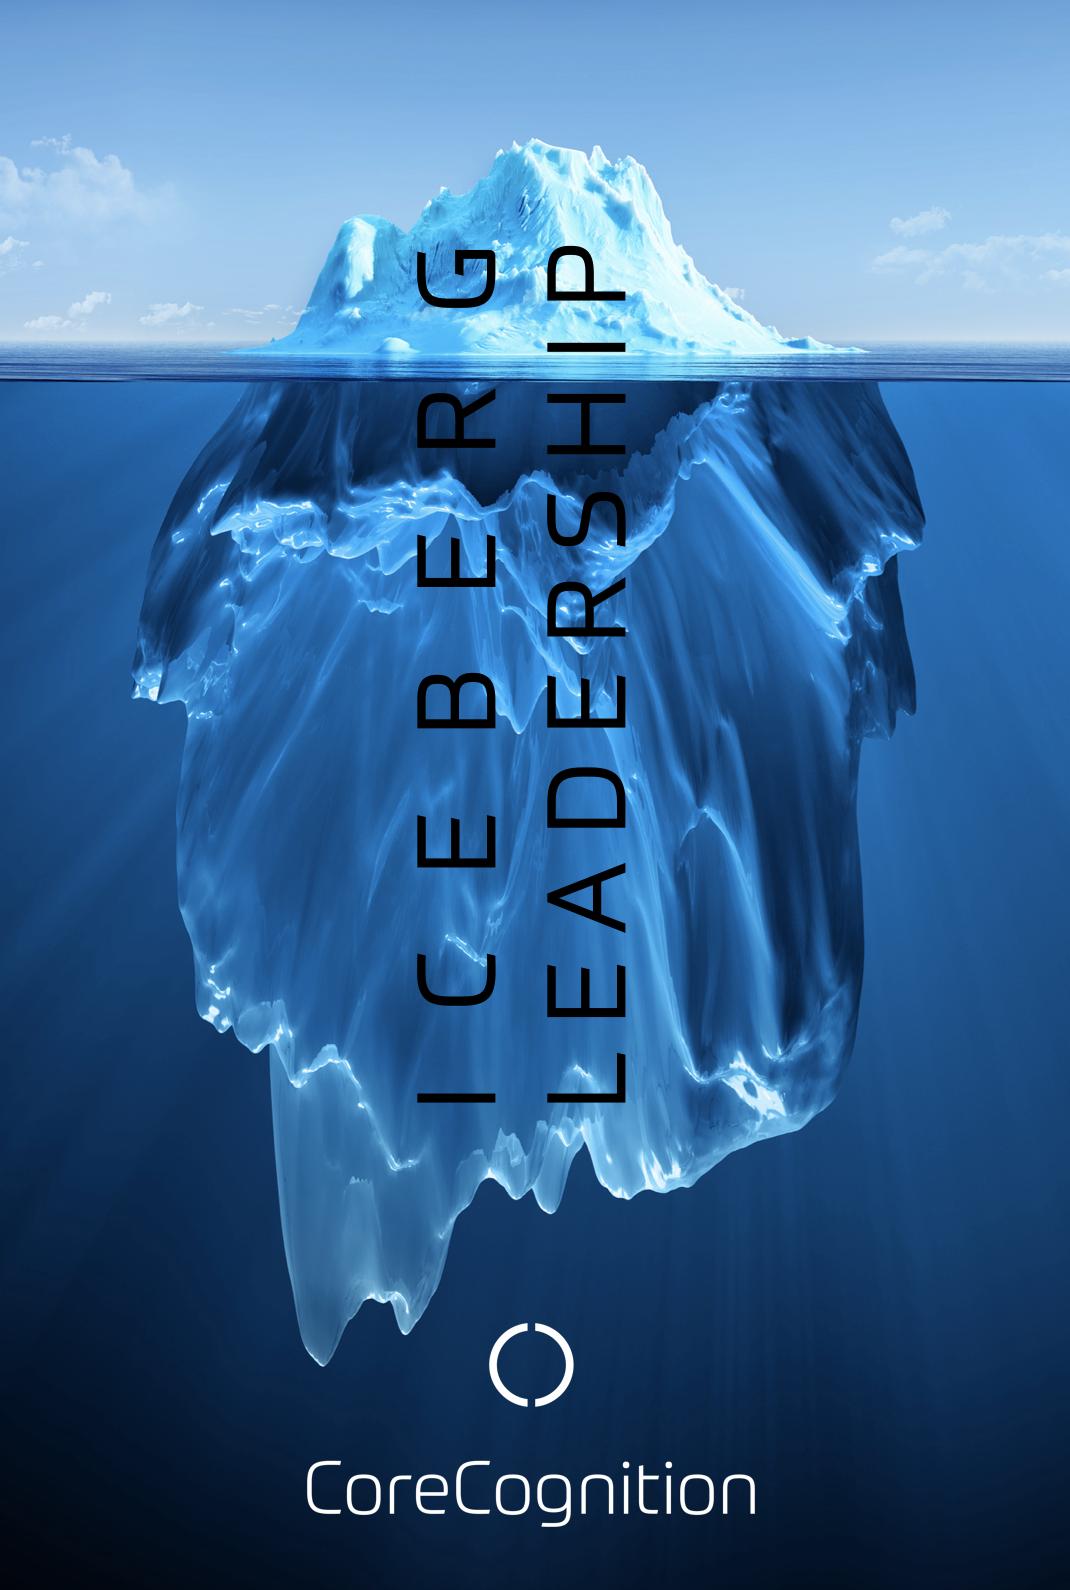 Iceberg leadership image.png